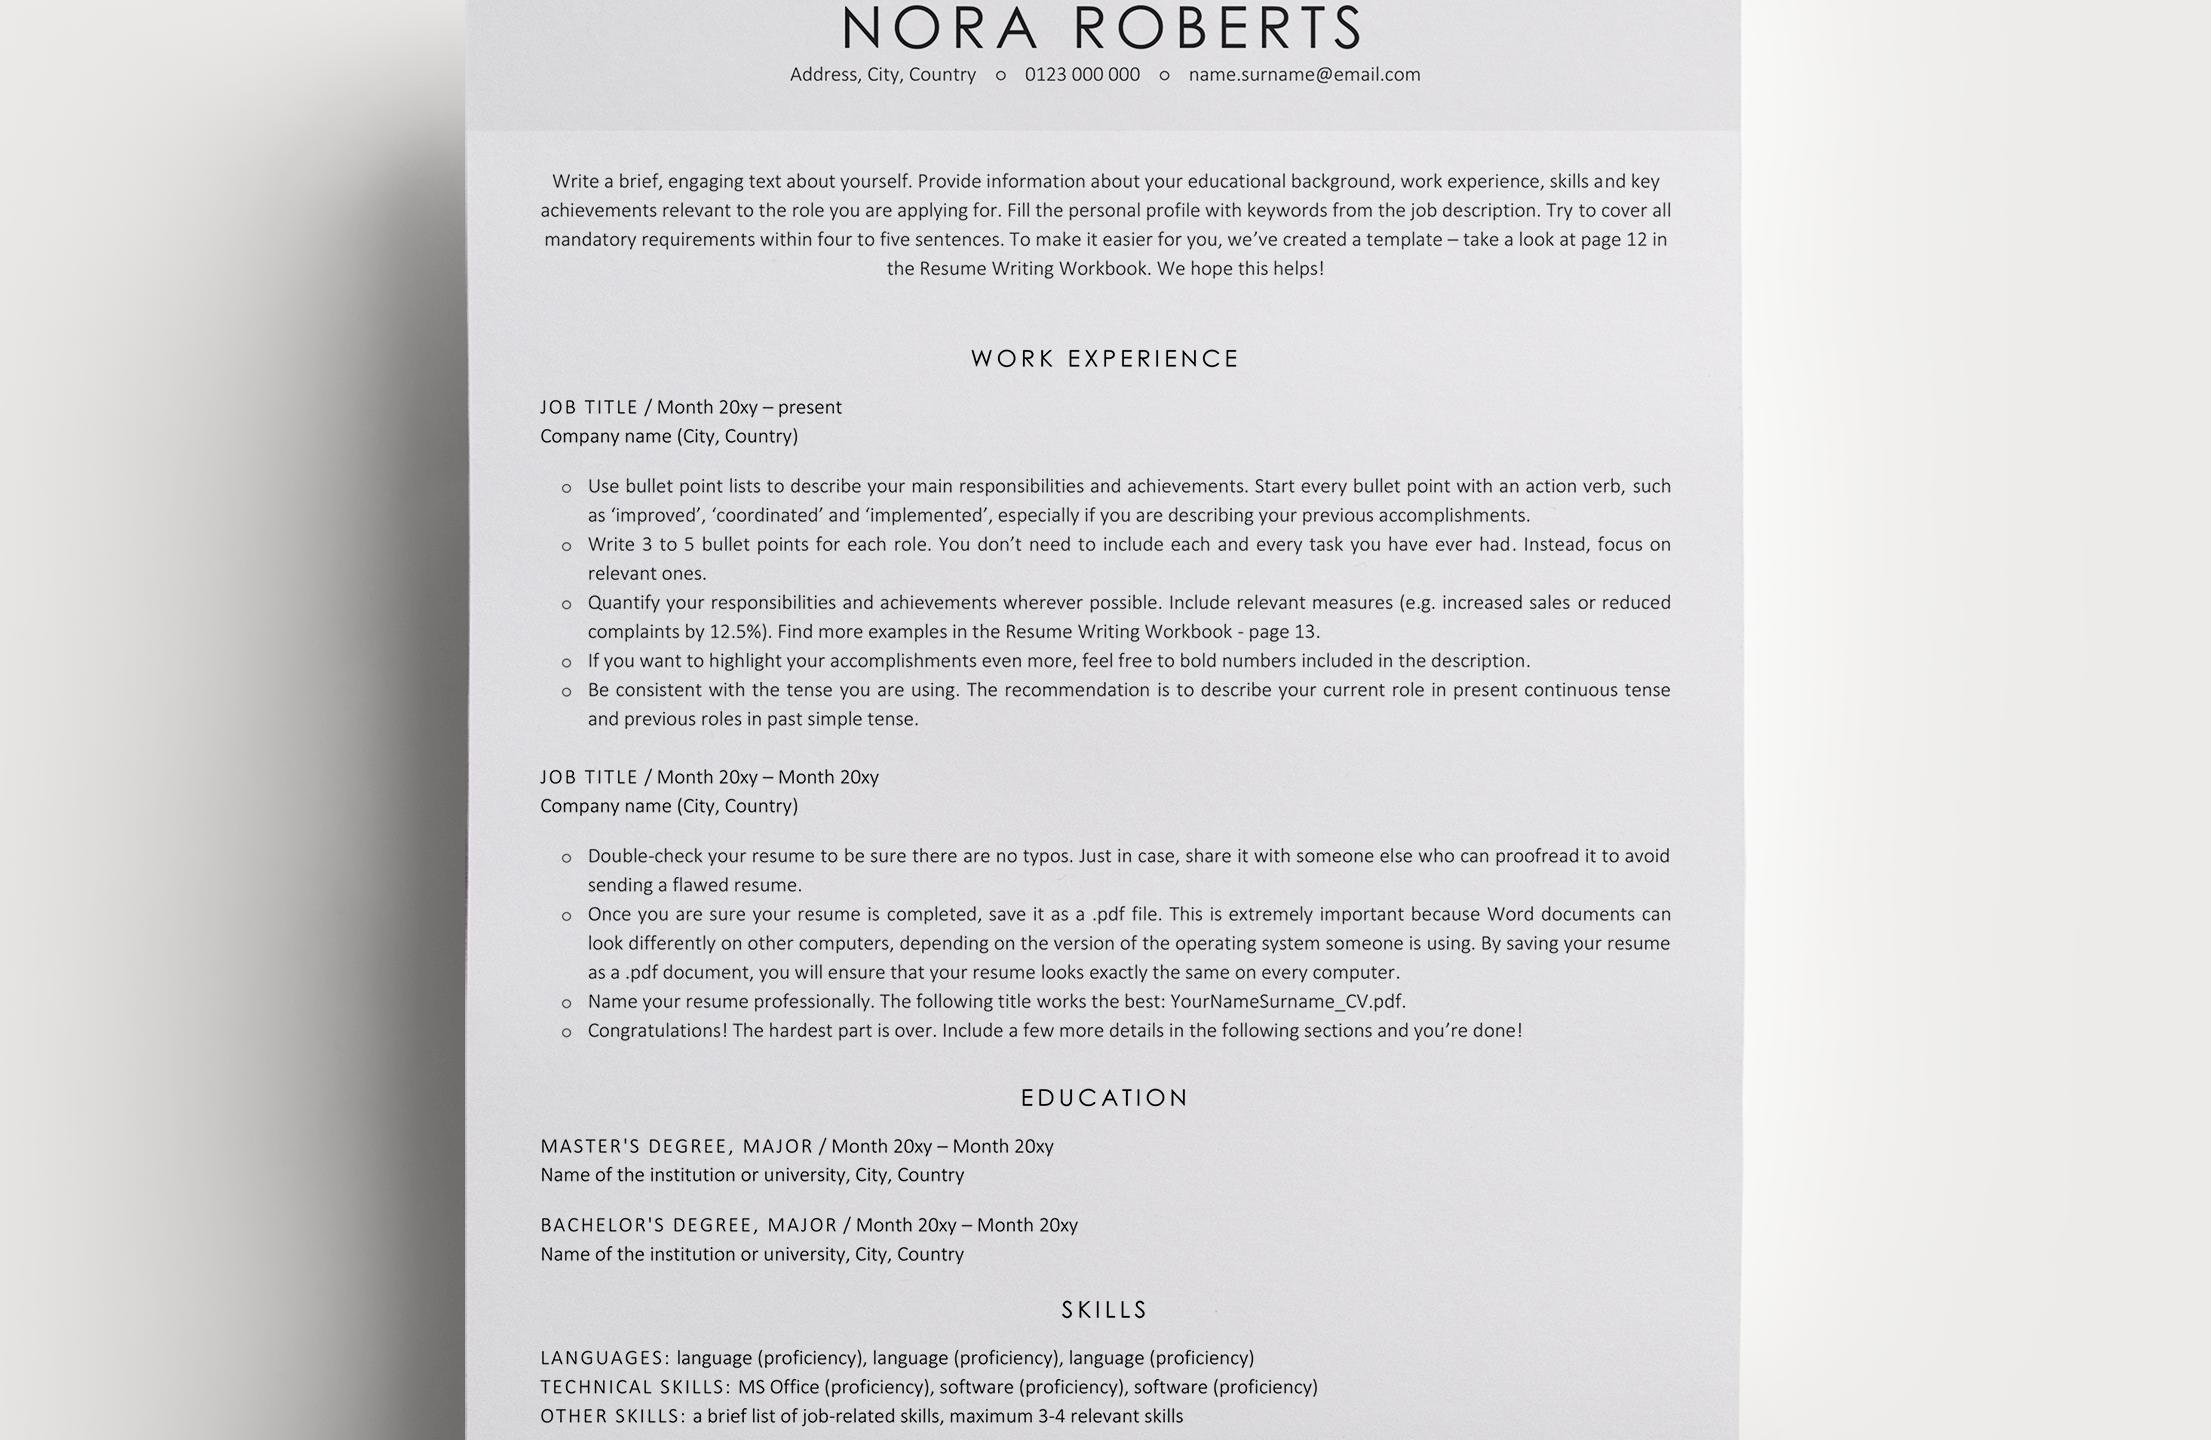 Resume Template Nora